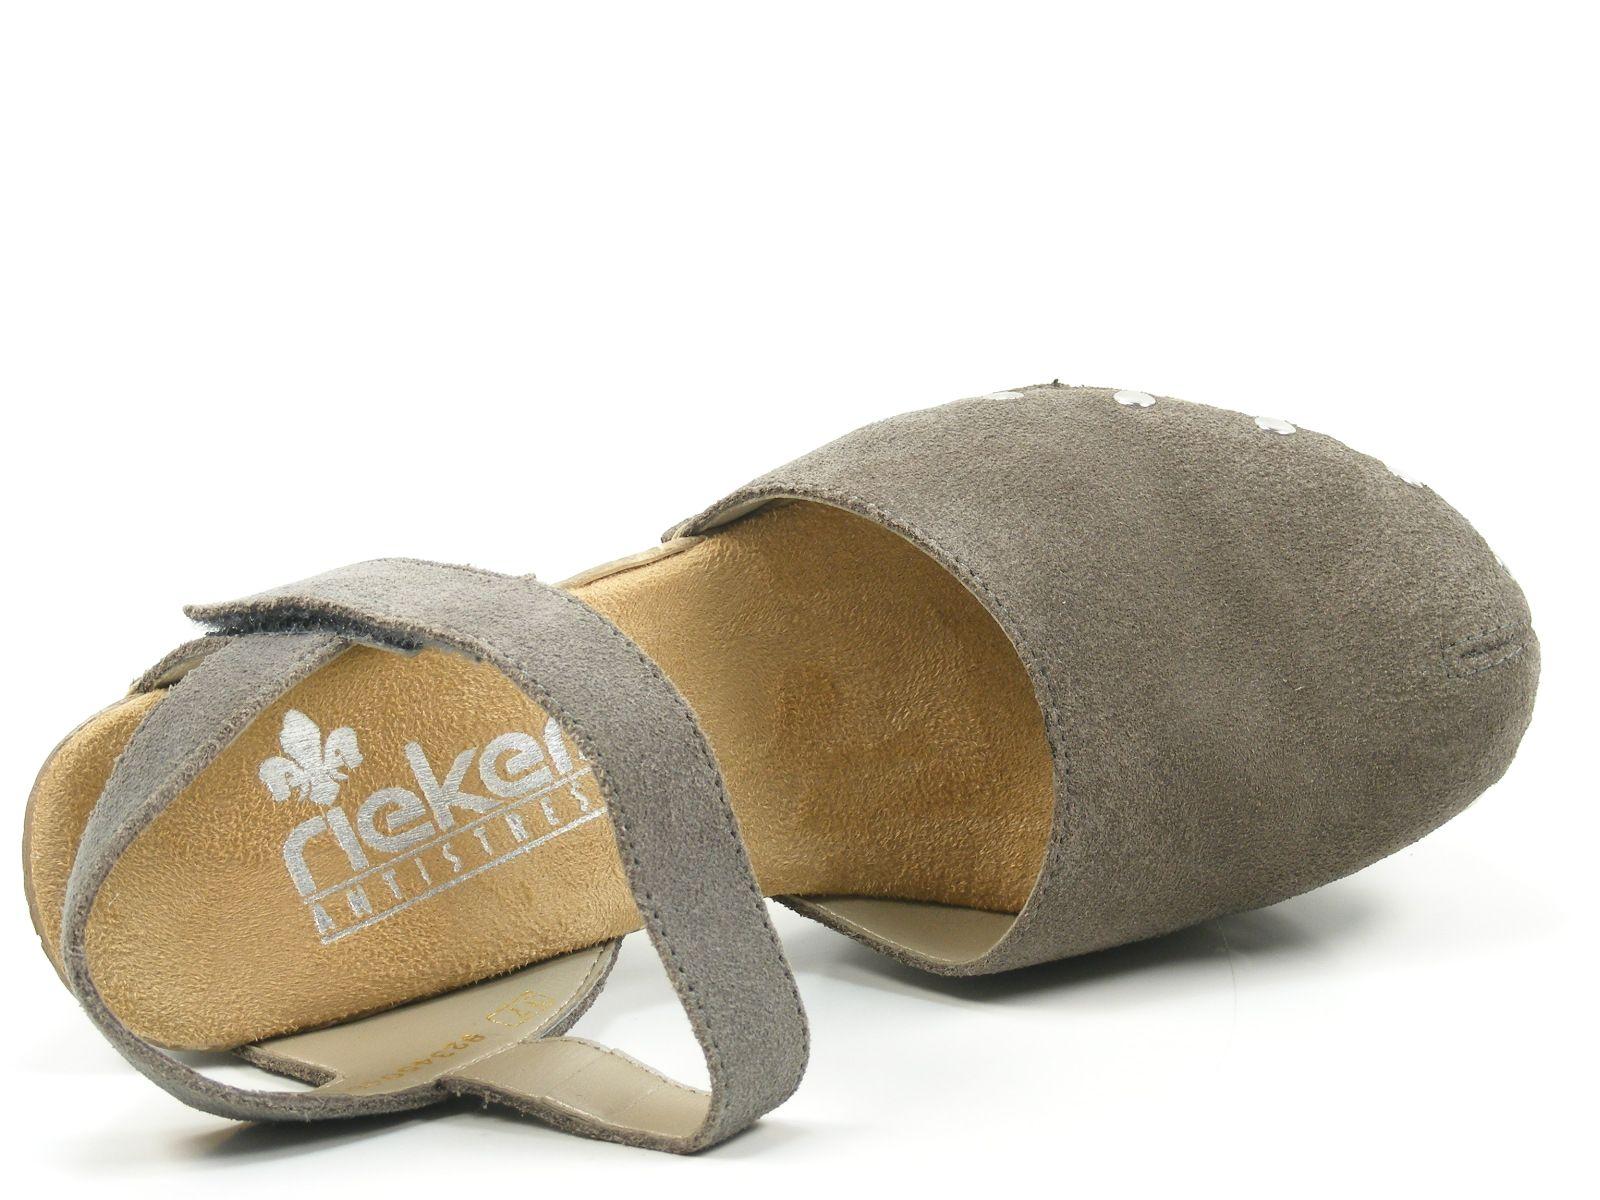 Rieker 66761 25 Schuhe Damen Plateau Sandalen Clogs | eBay 8fX7m